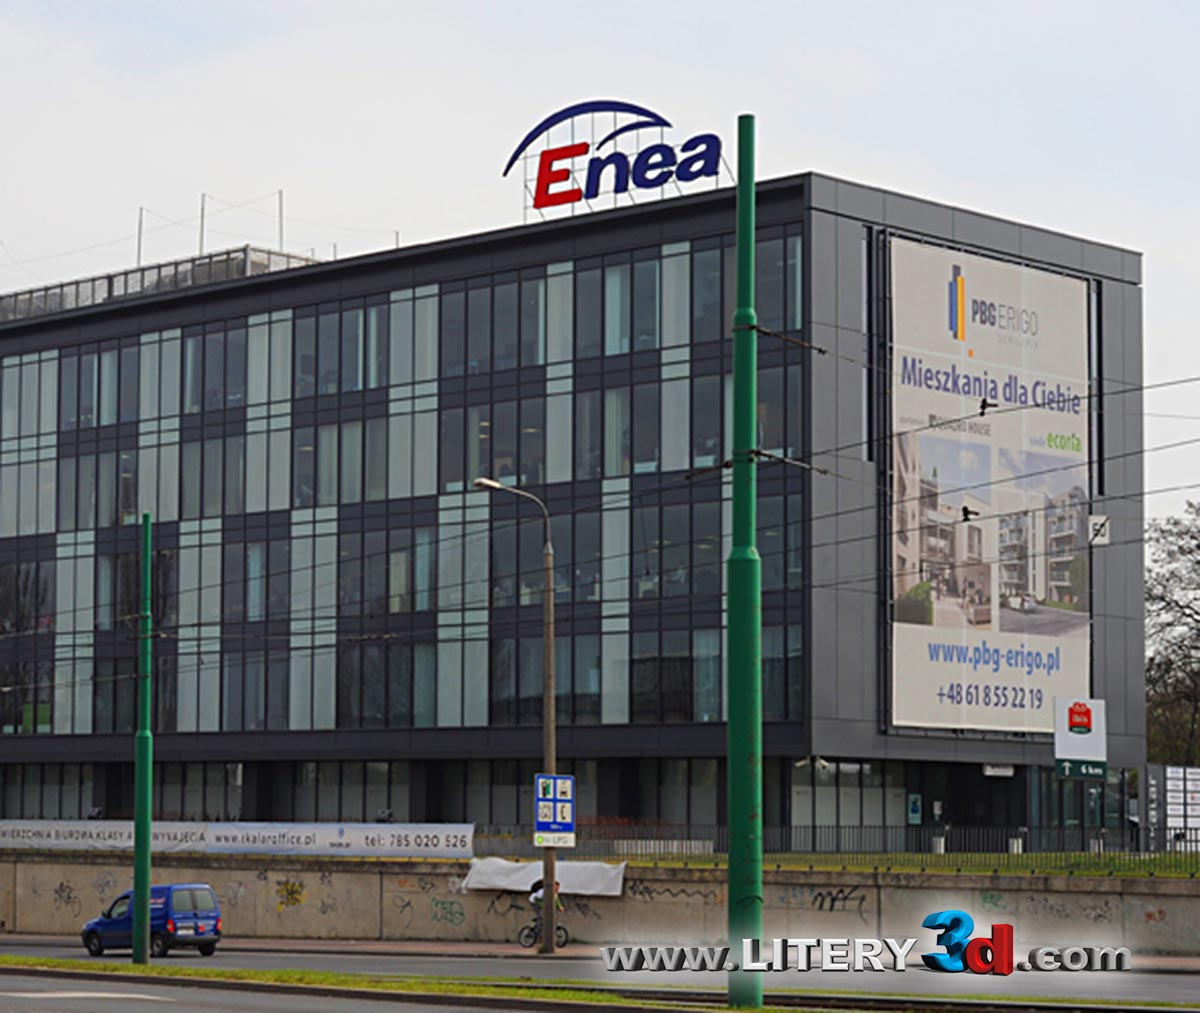 Enea_1